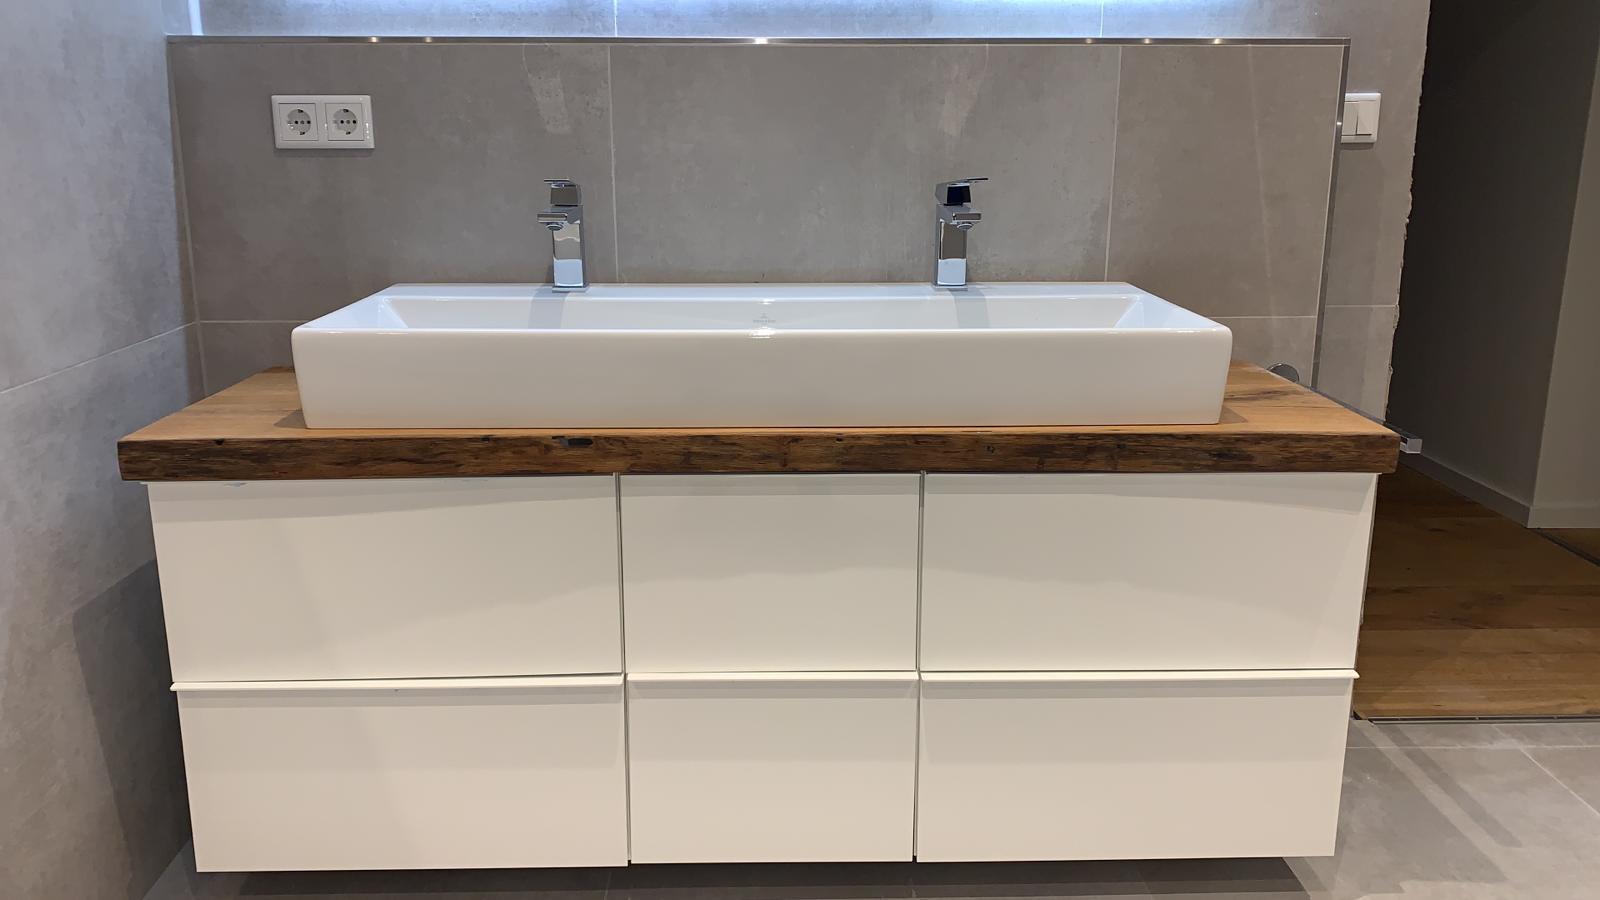 Holztischwerk Waschtischplatte